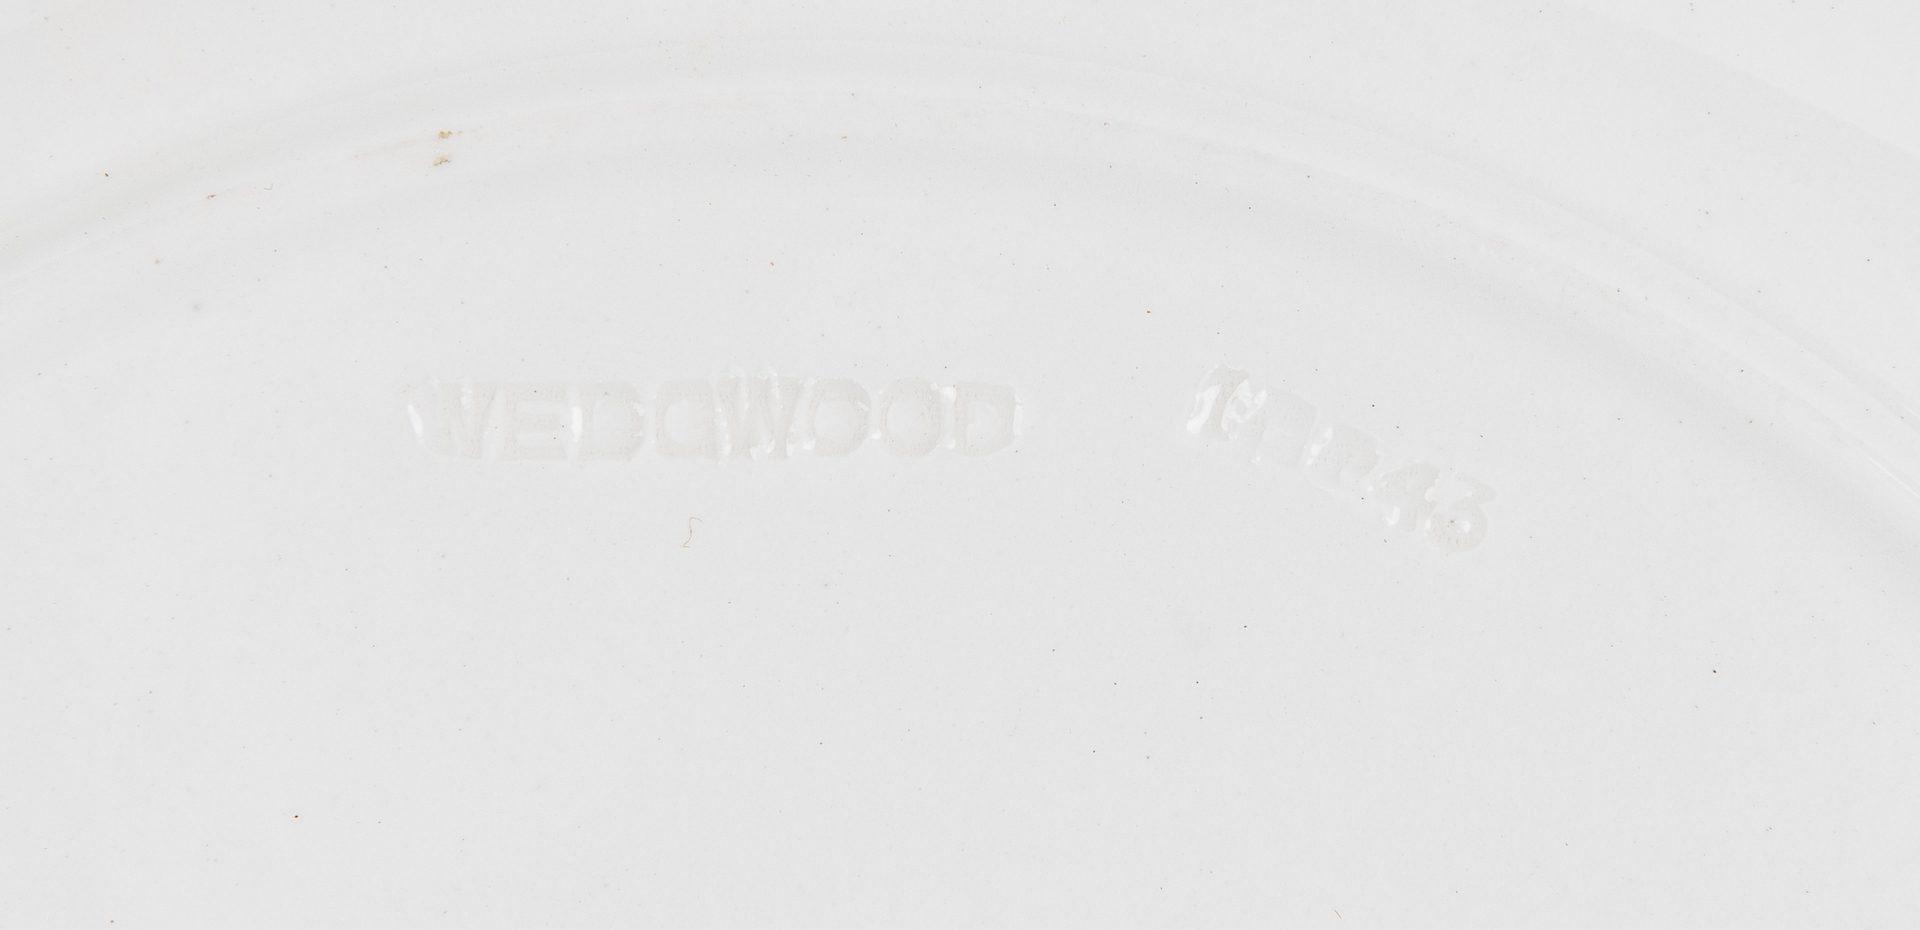 Lot 175: 6 Wedgwood Naval Academy Plates